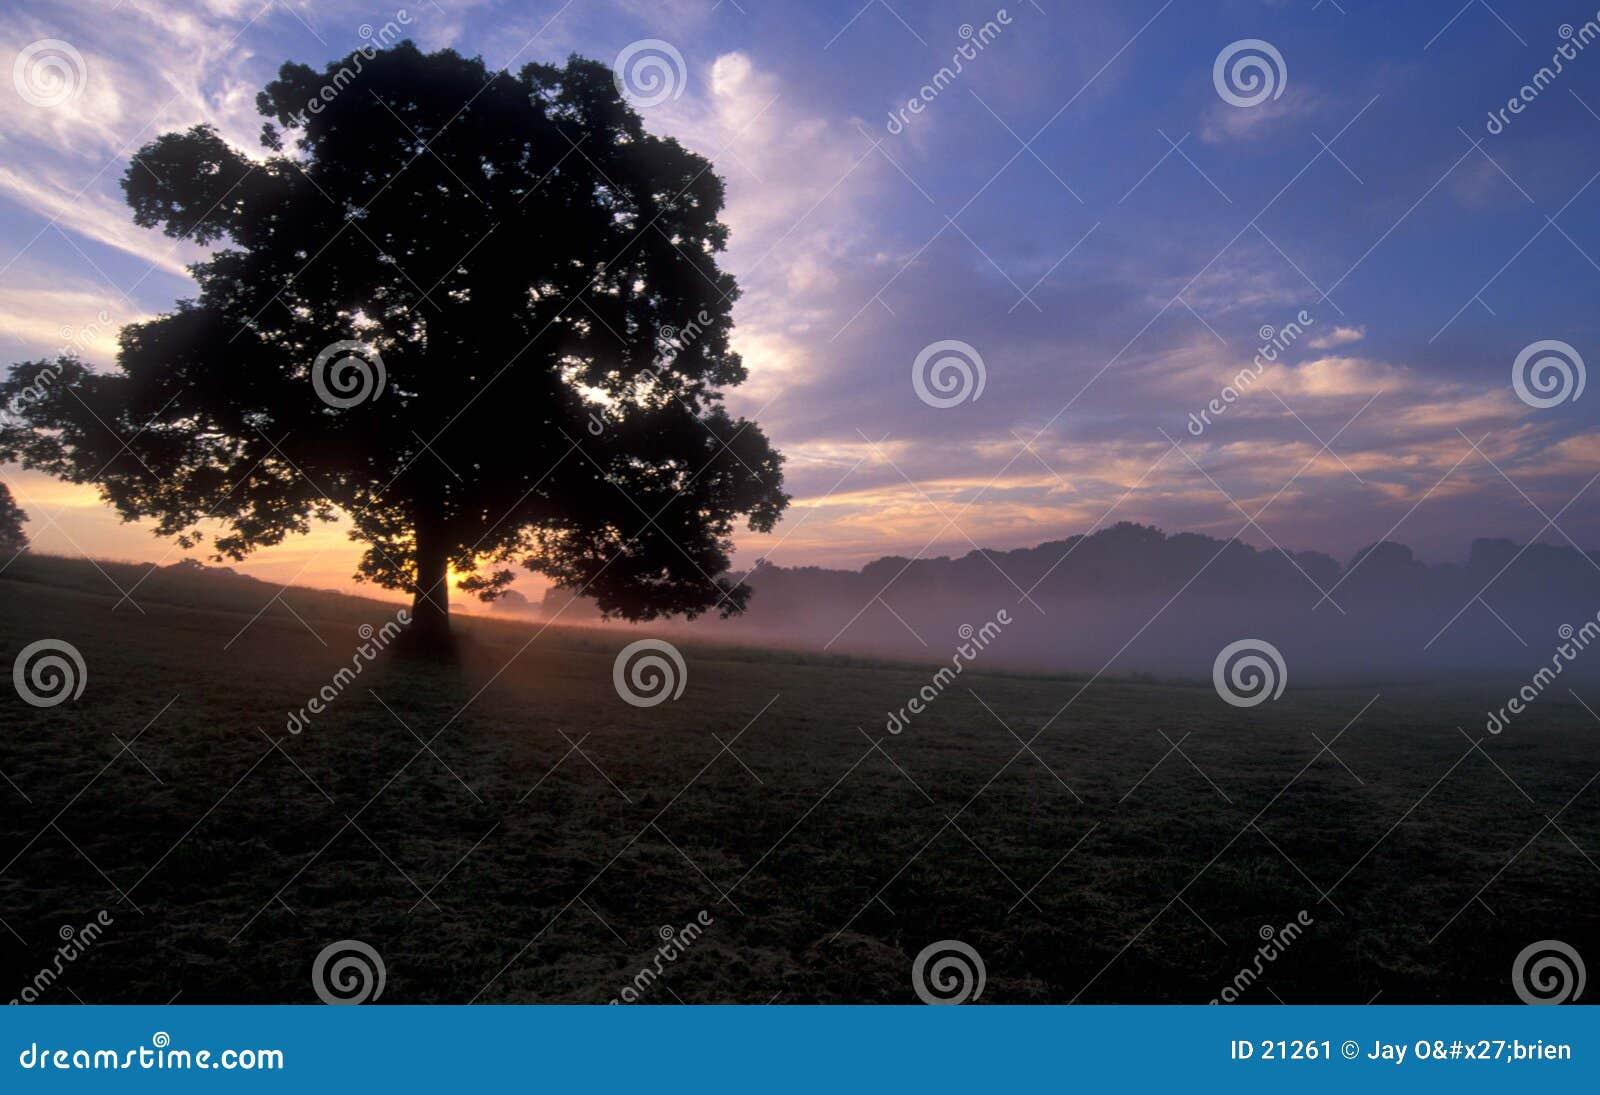 Baum am Sonnenaufgang